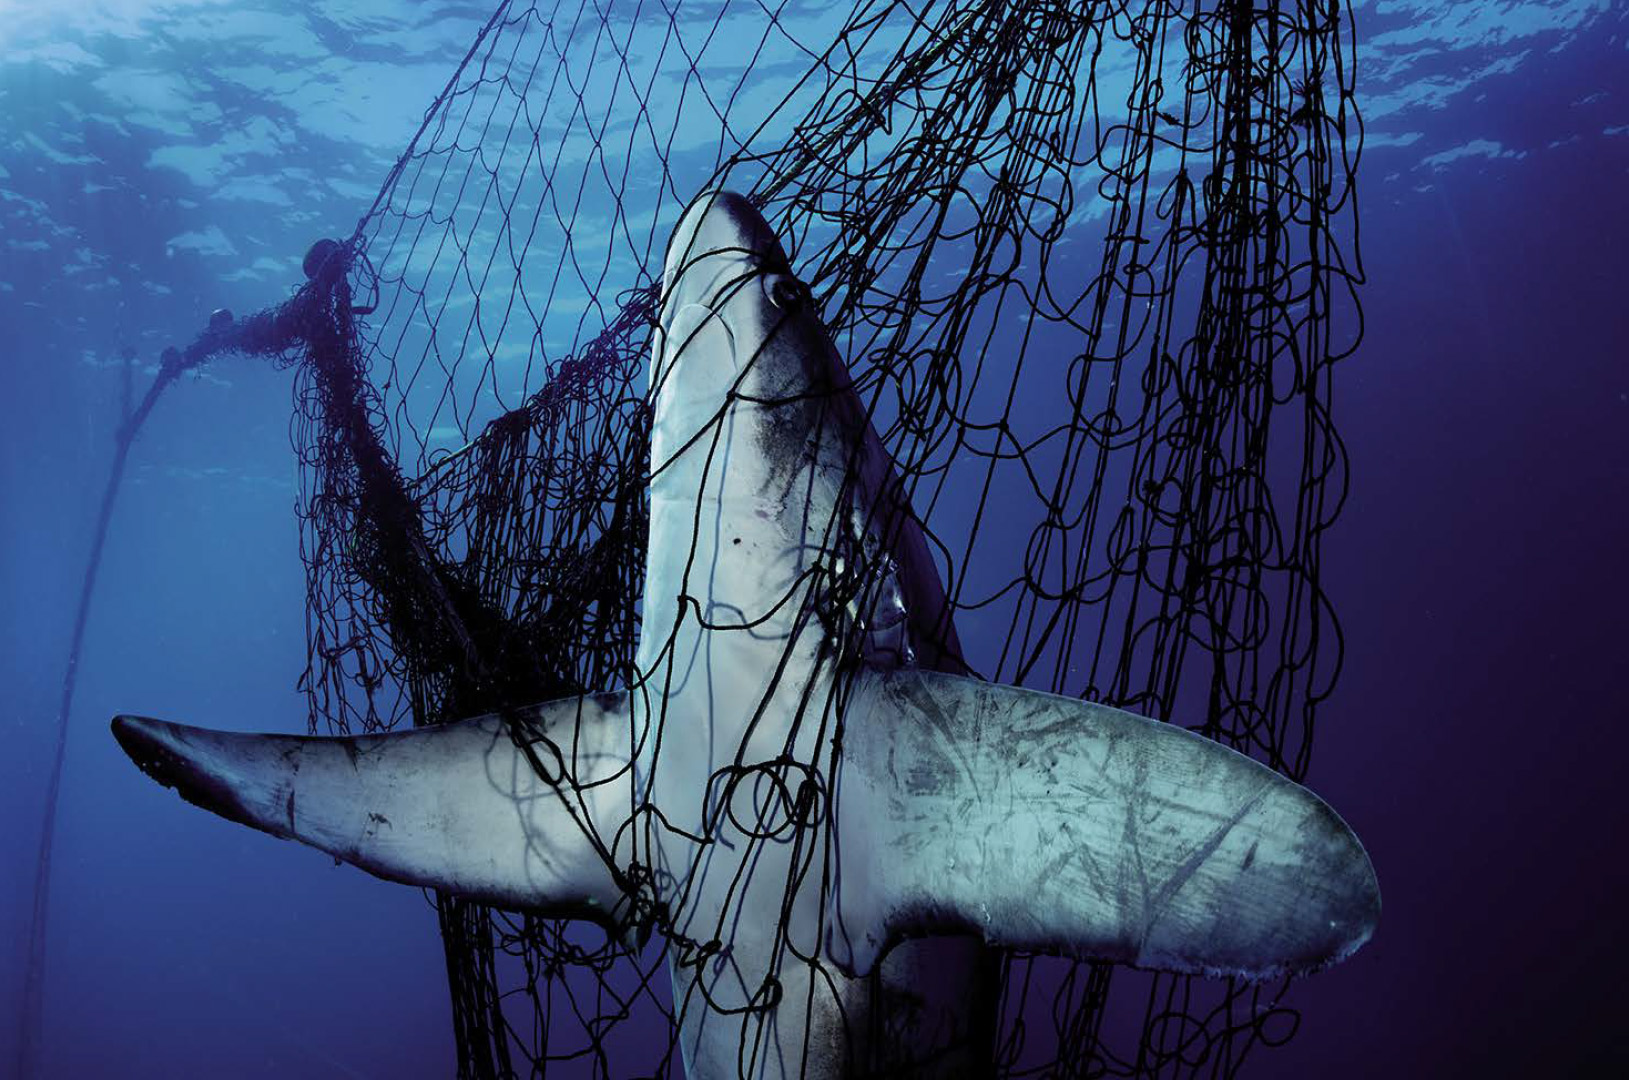 WC_Shark.jpg